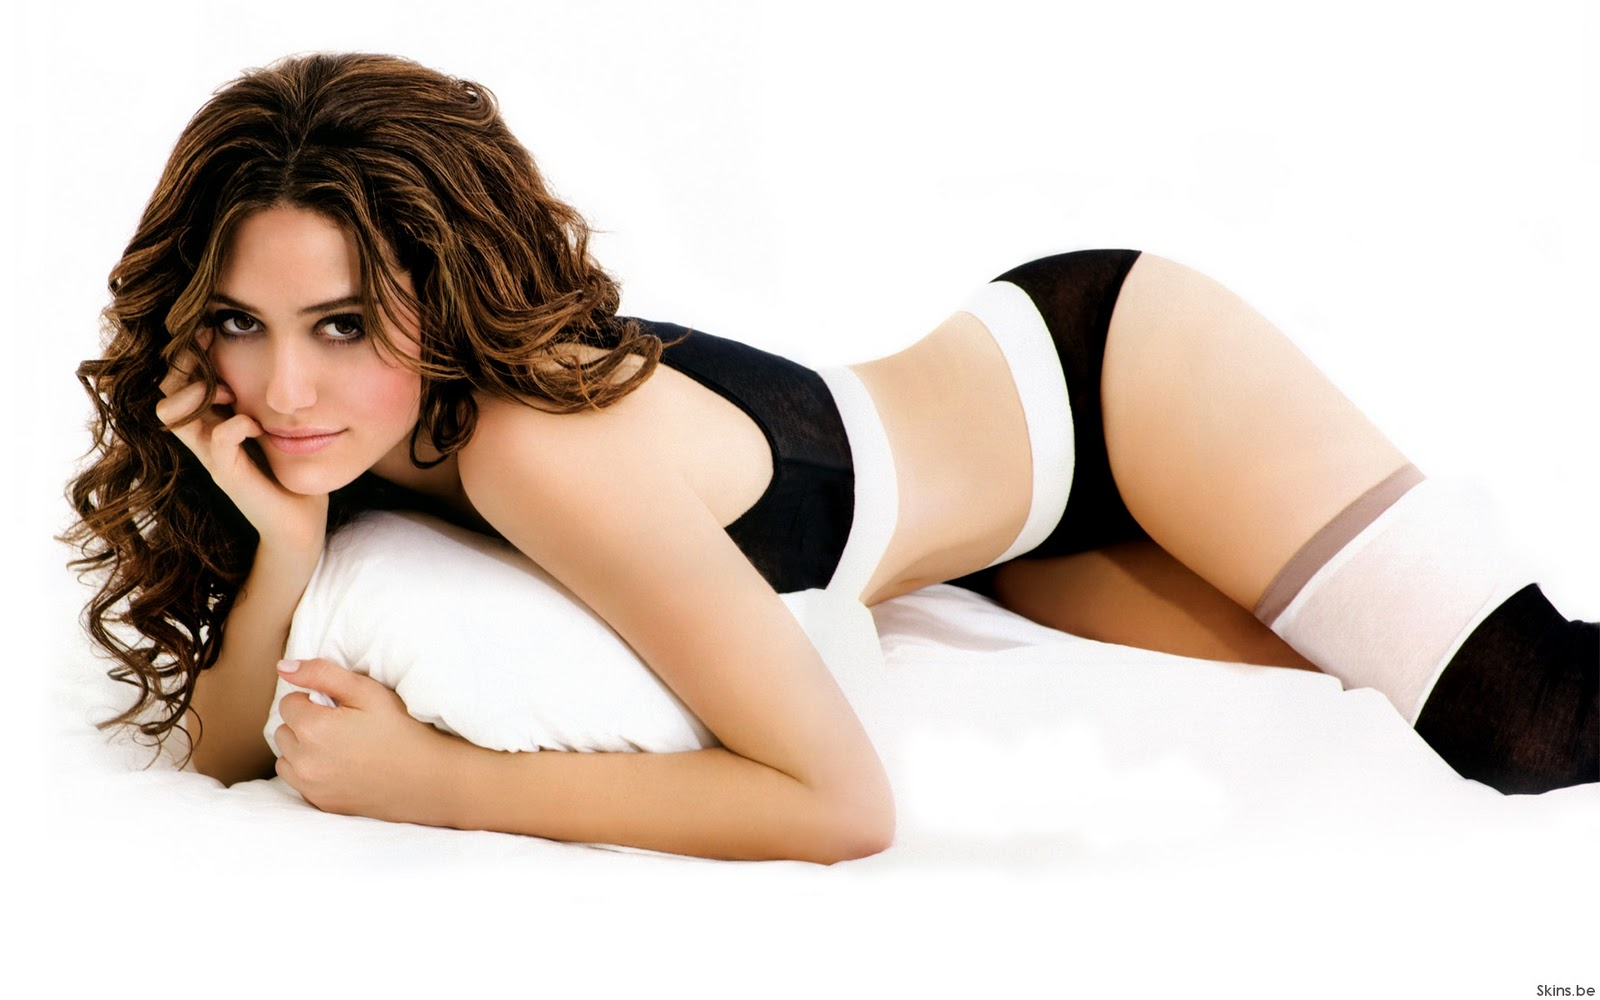 Emmy Rossum en lingerie